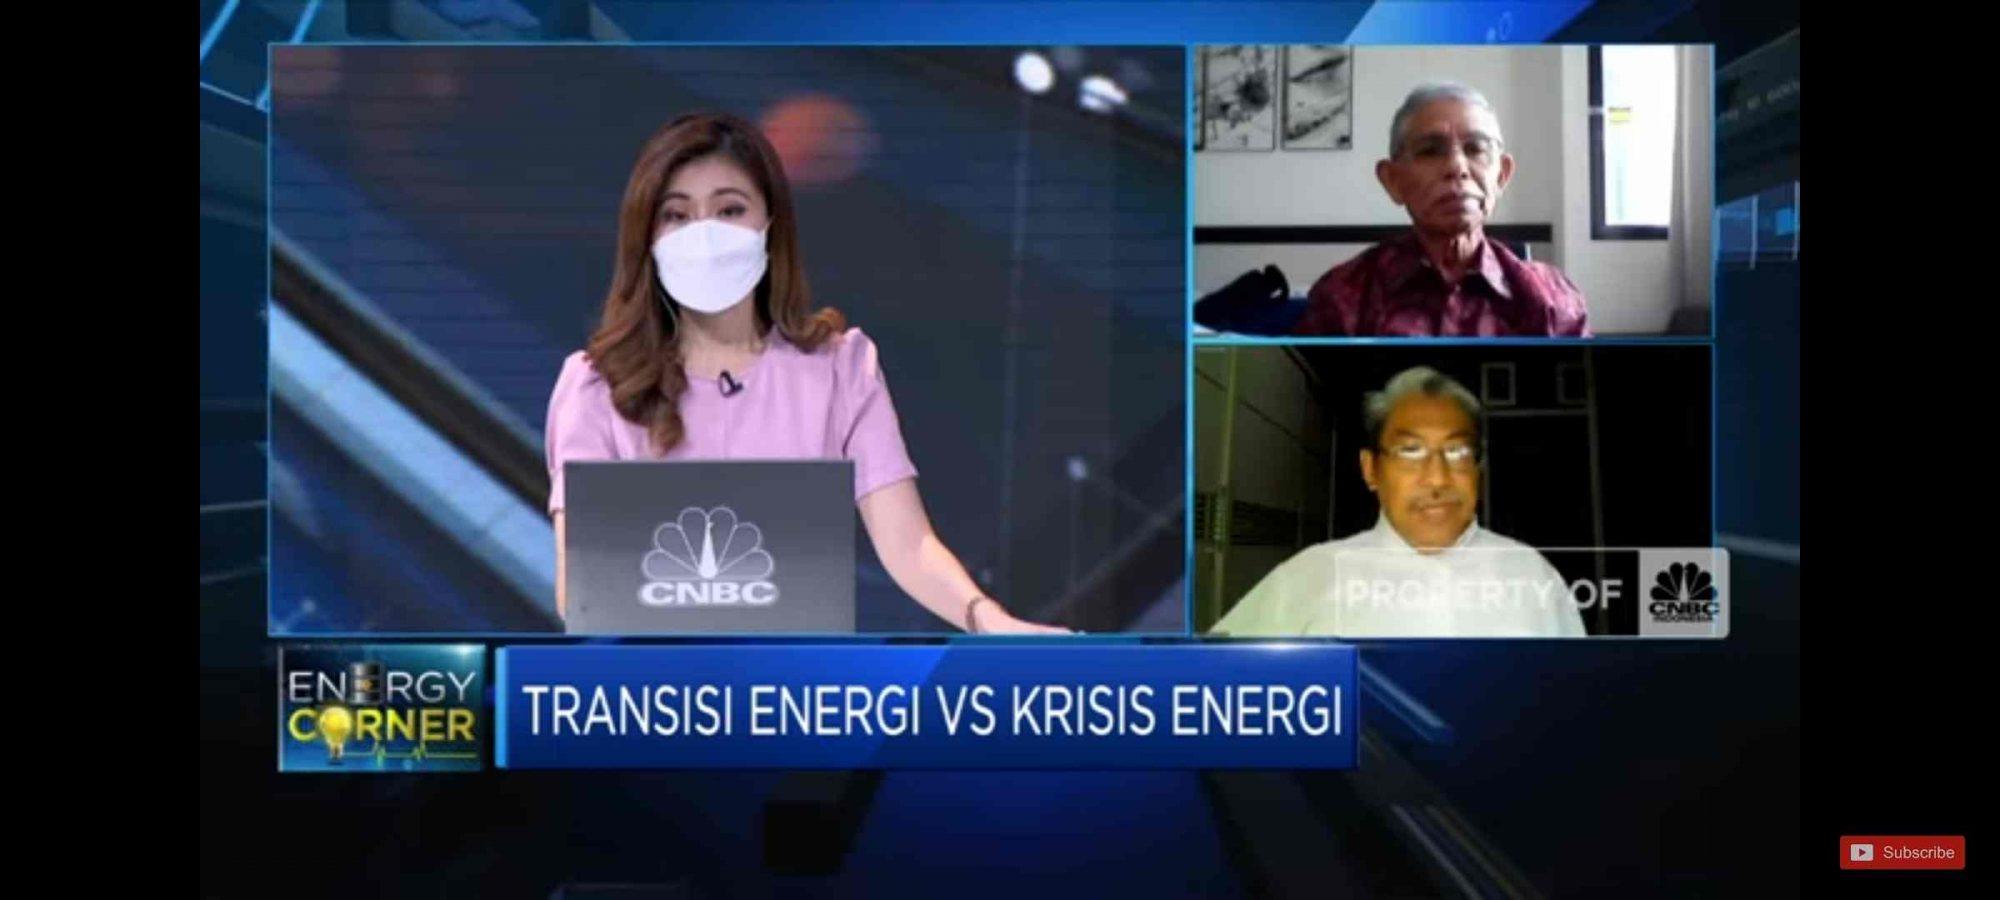 Krisis Energi